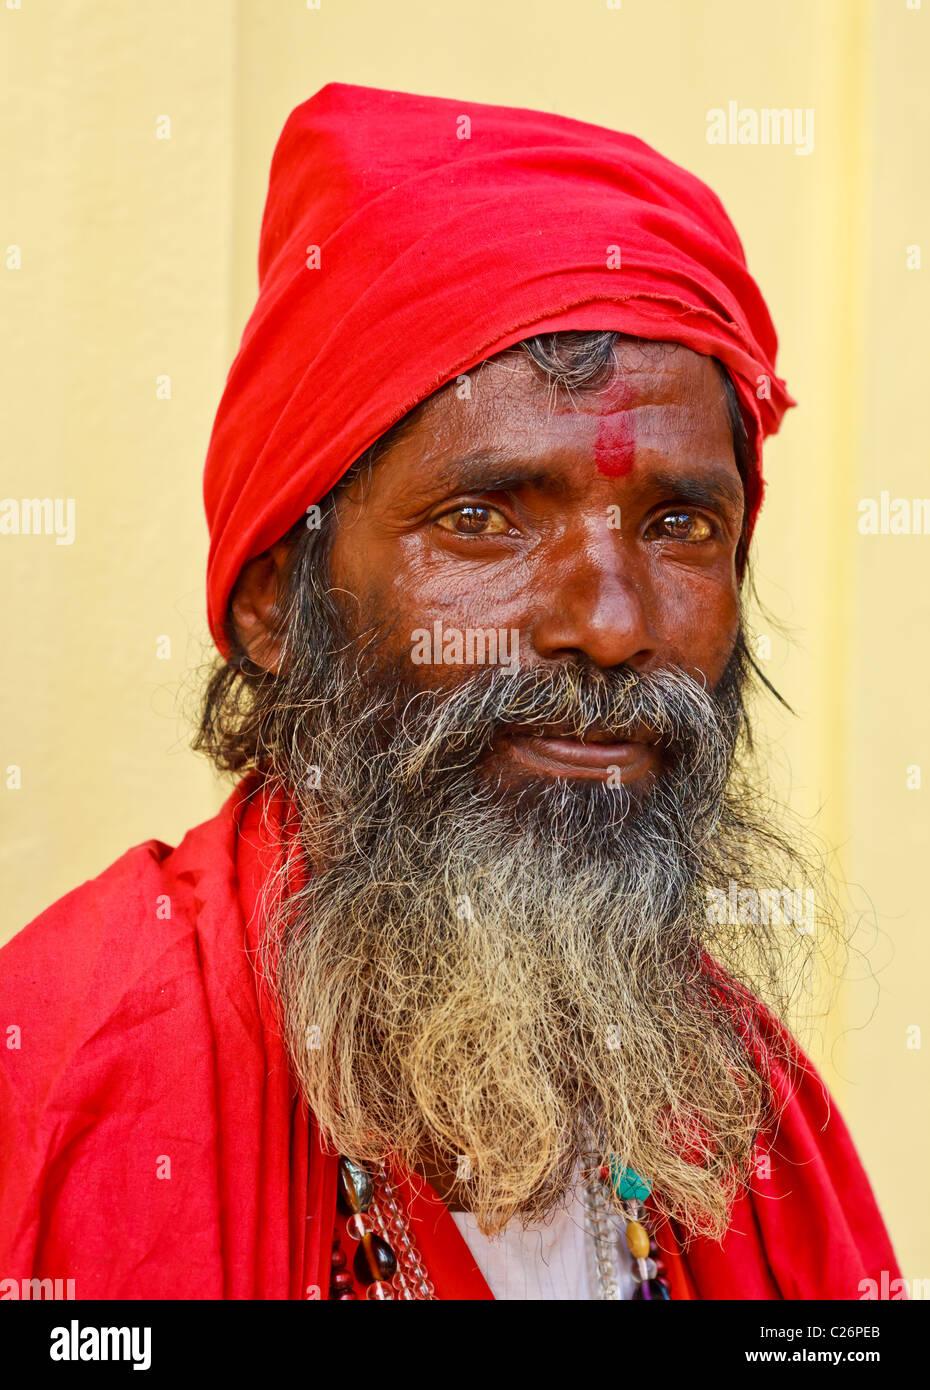 Portrait of elderly sadhu dressed in red clothes, Kamakhya Temple, Guwahati, India - Stock Image